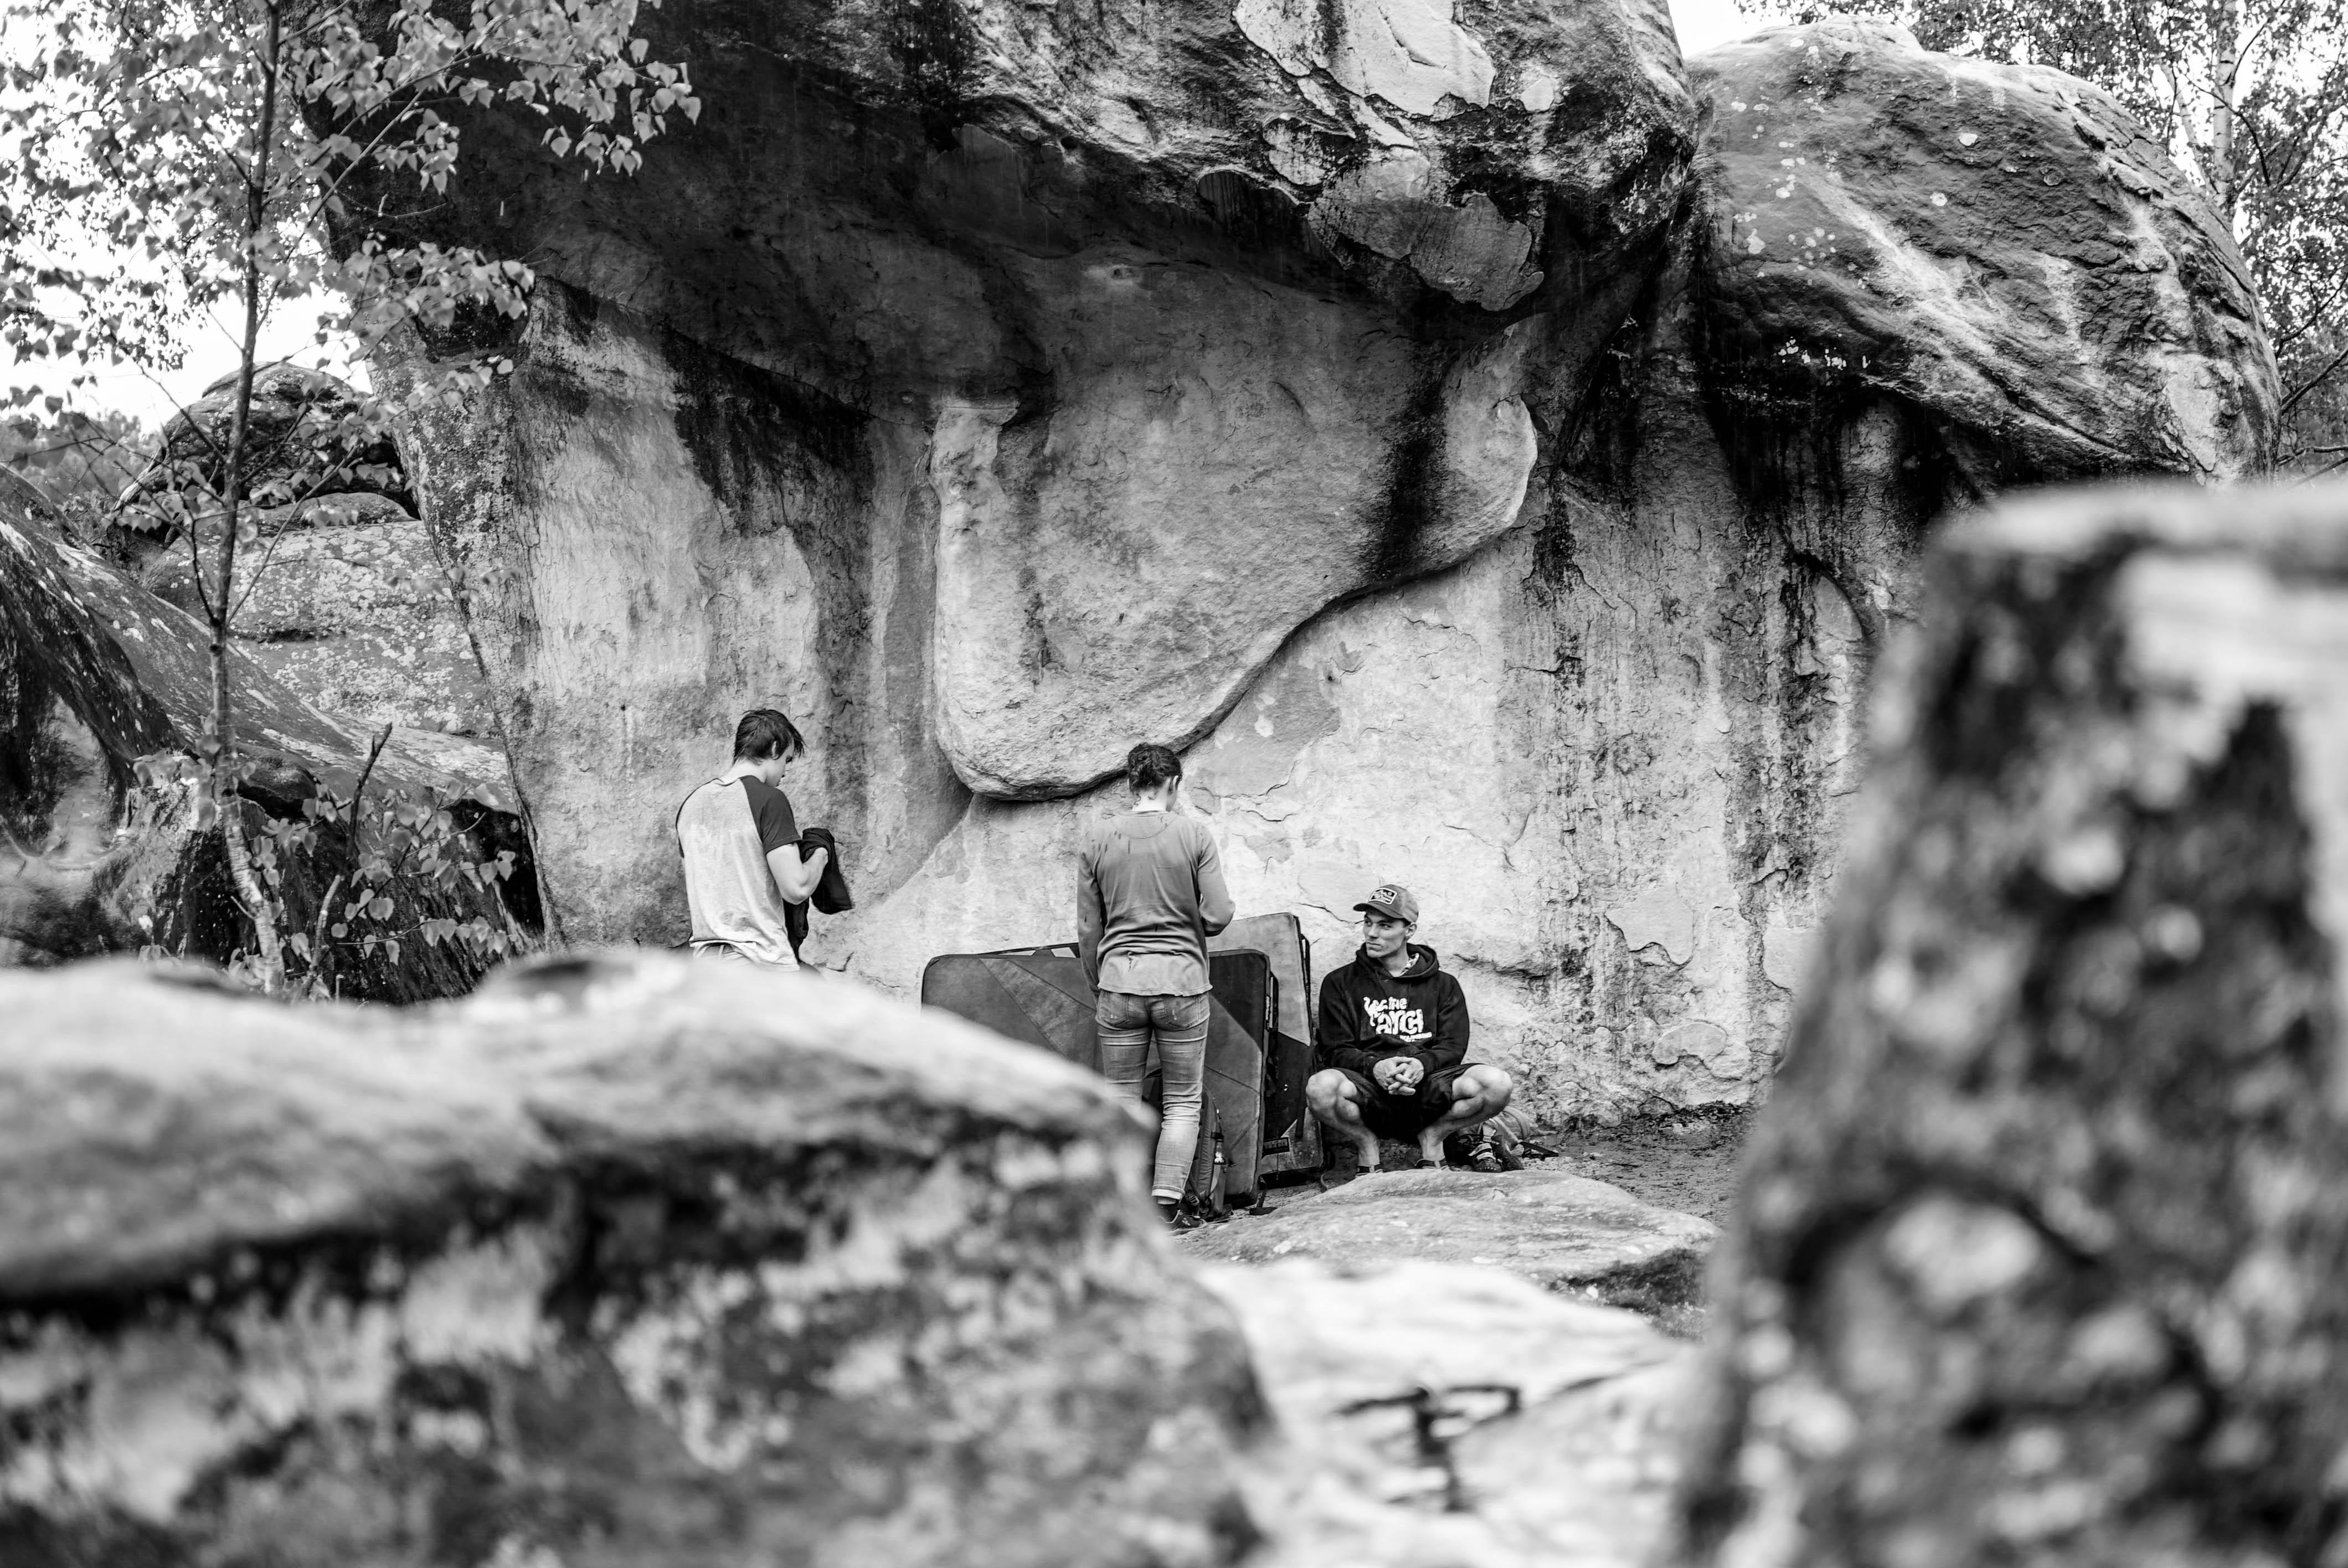 fontainbleau climbing 2016 mike brindley-25